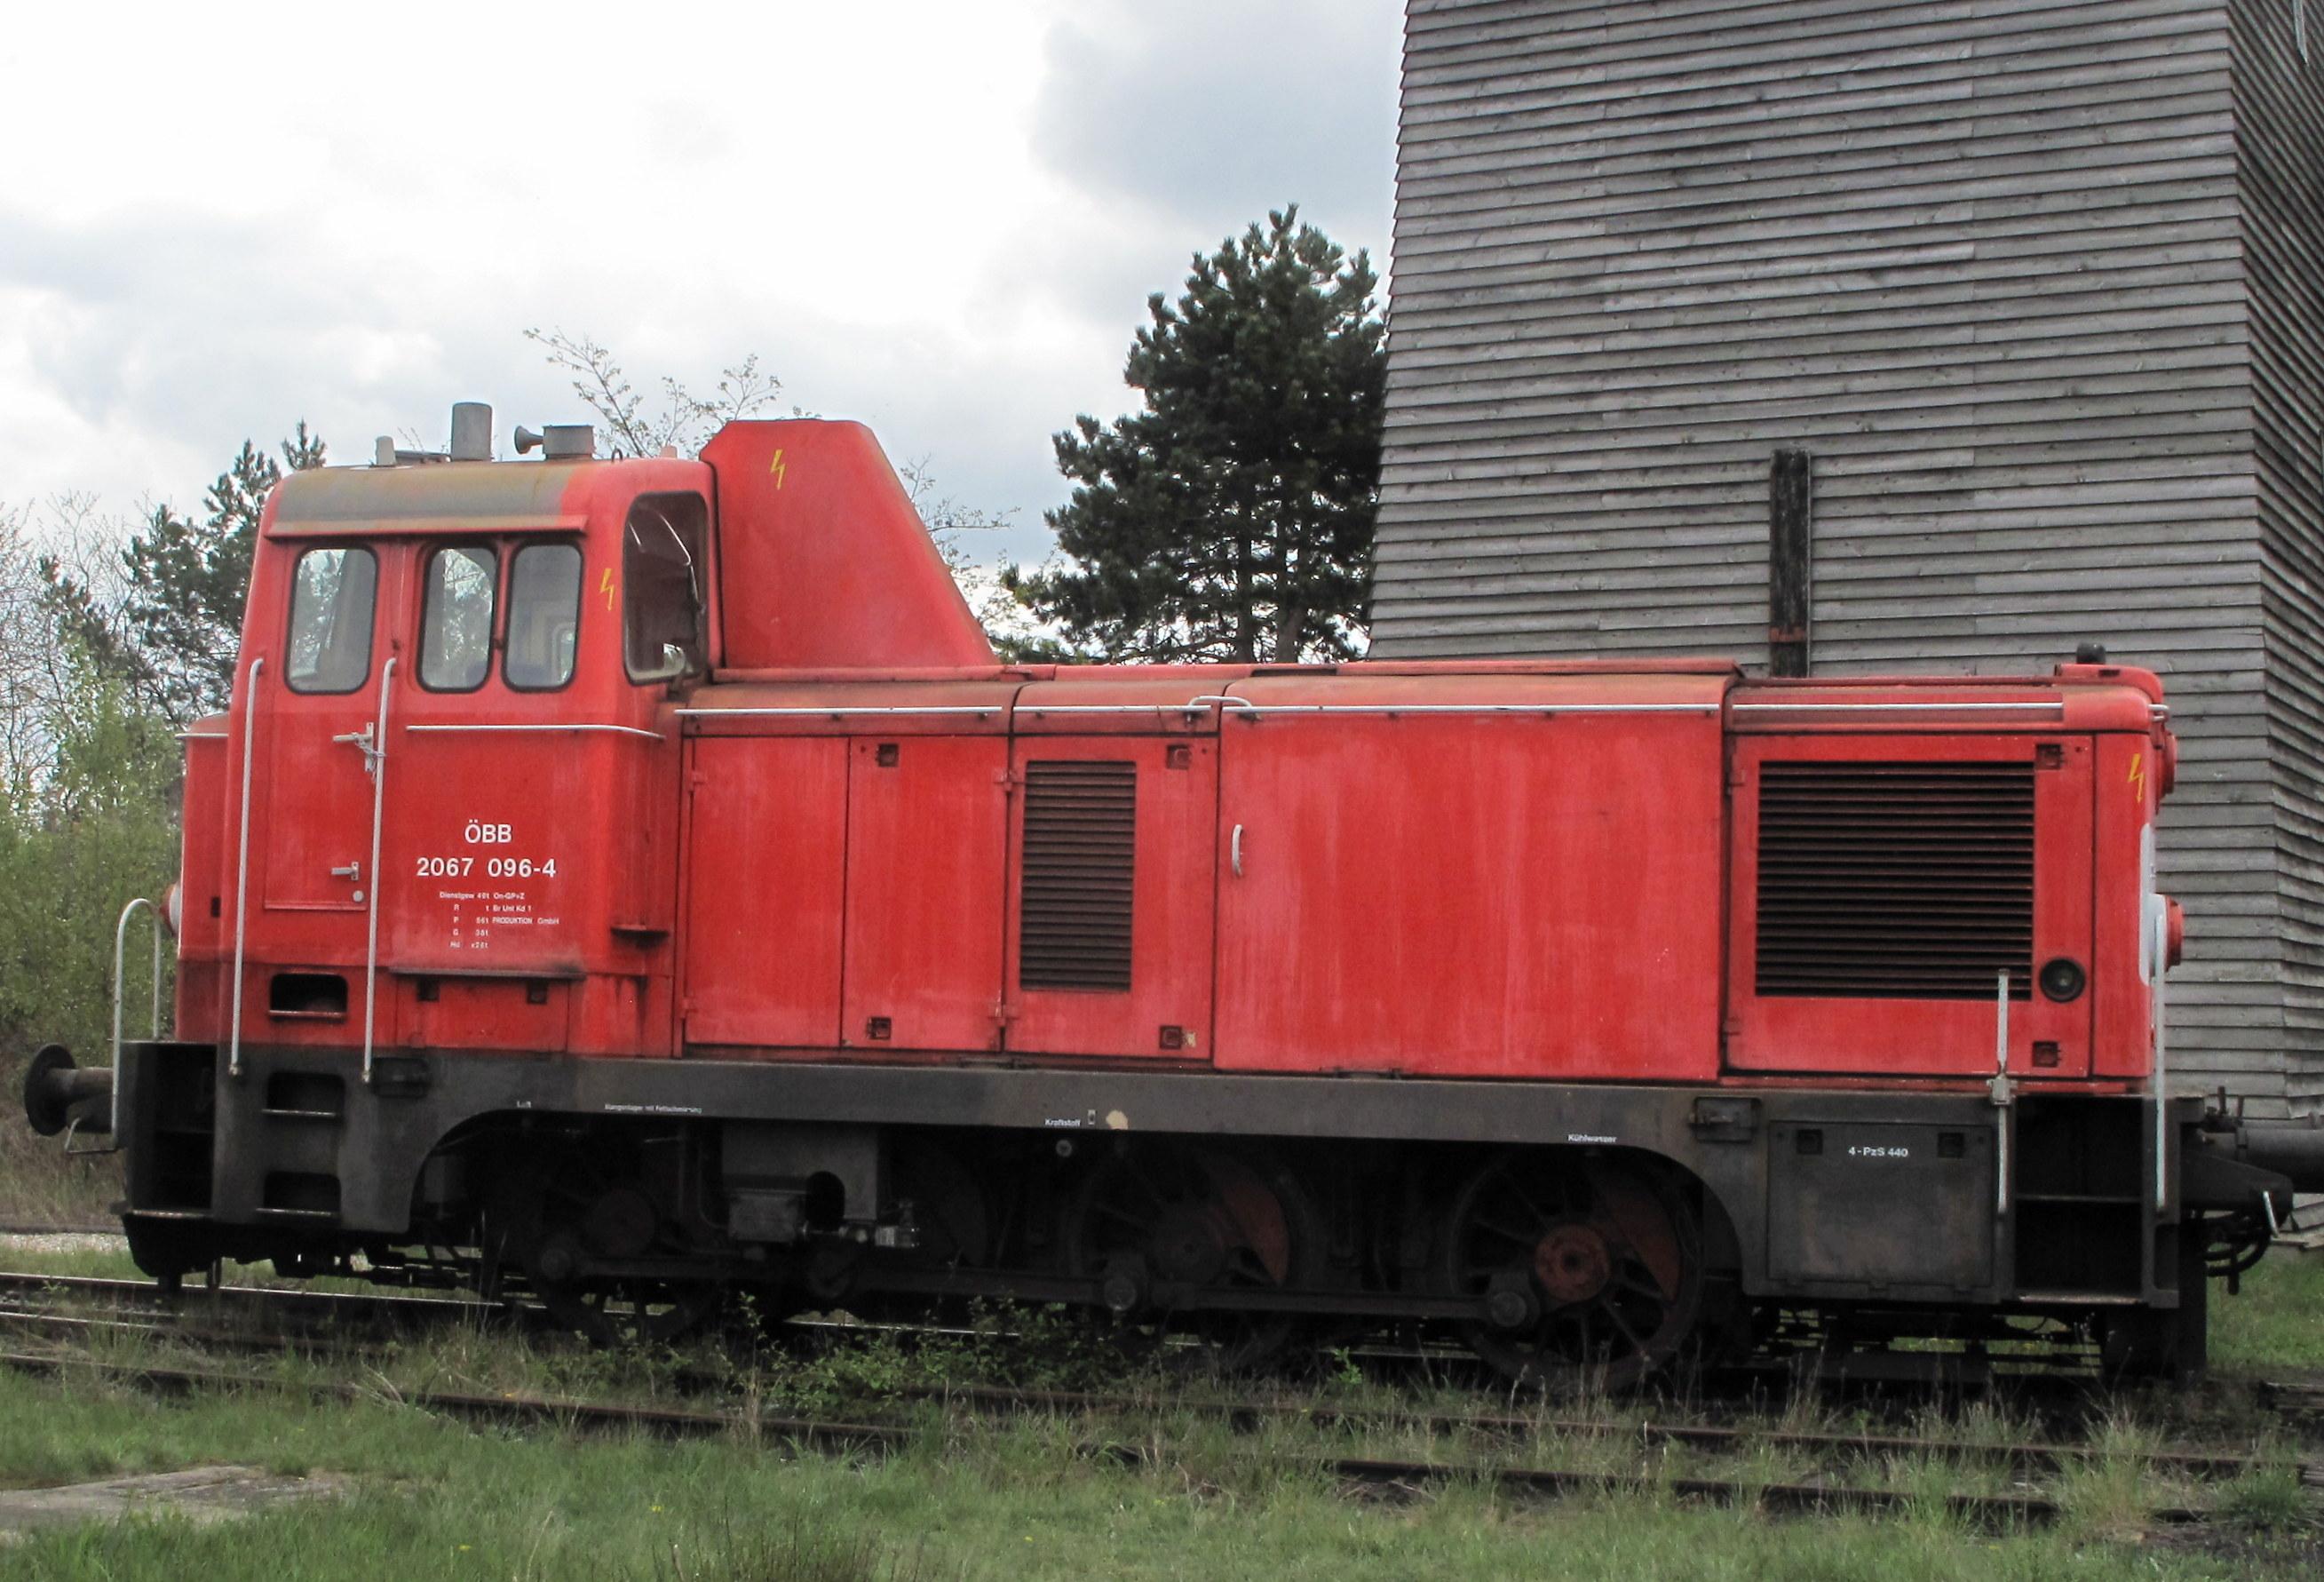 File:ÖBB Class 2067 0-8-0.JPG